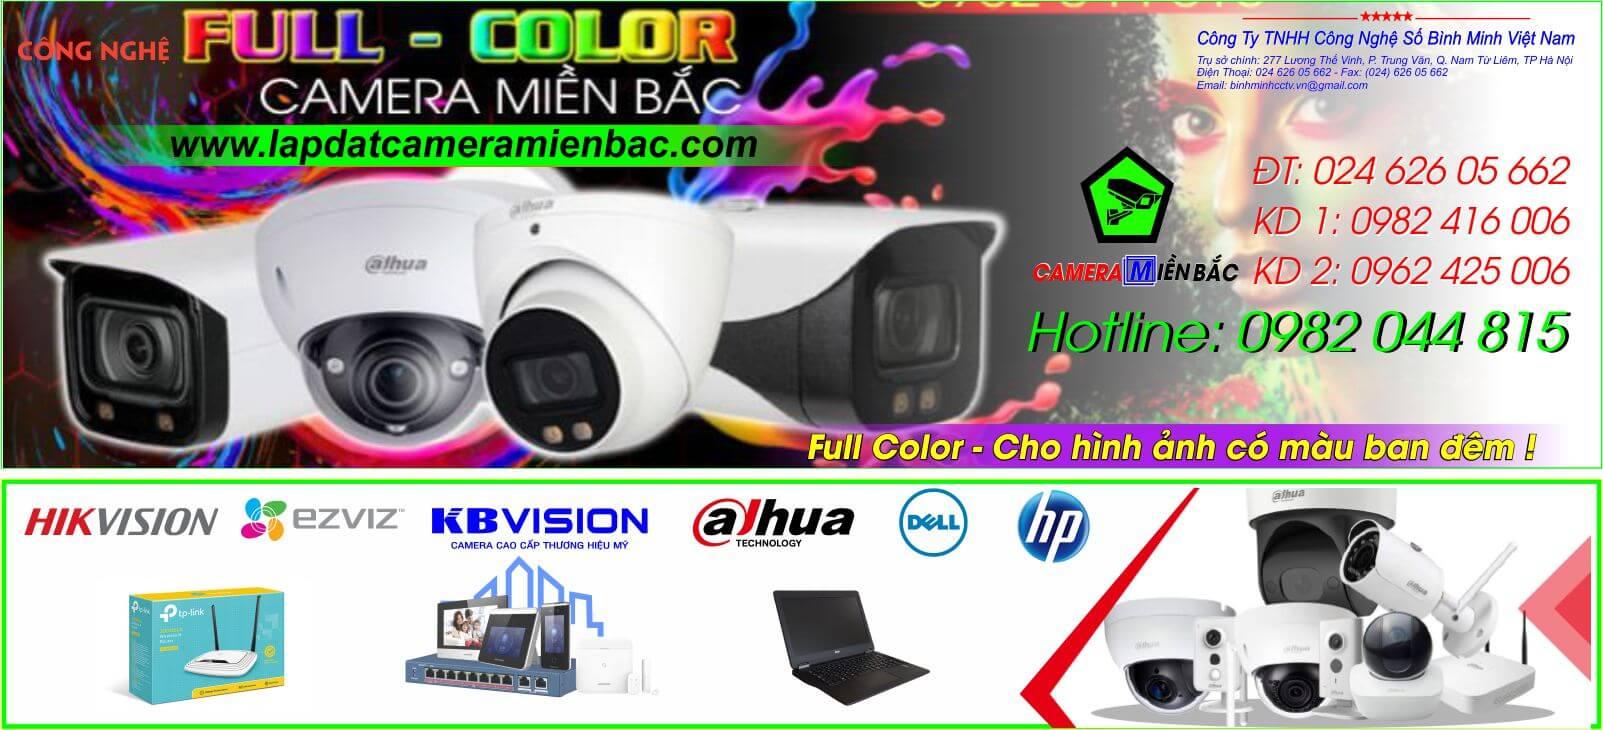 Camera Miền Bắc -Lapdatcameramienbac.com